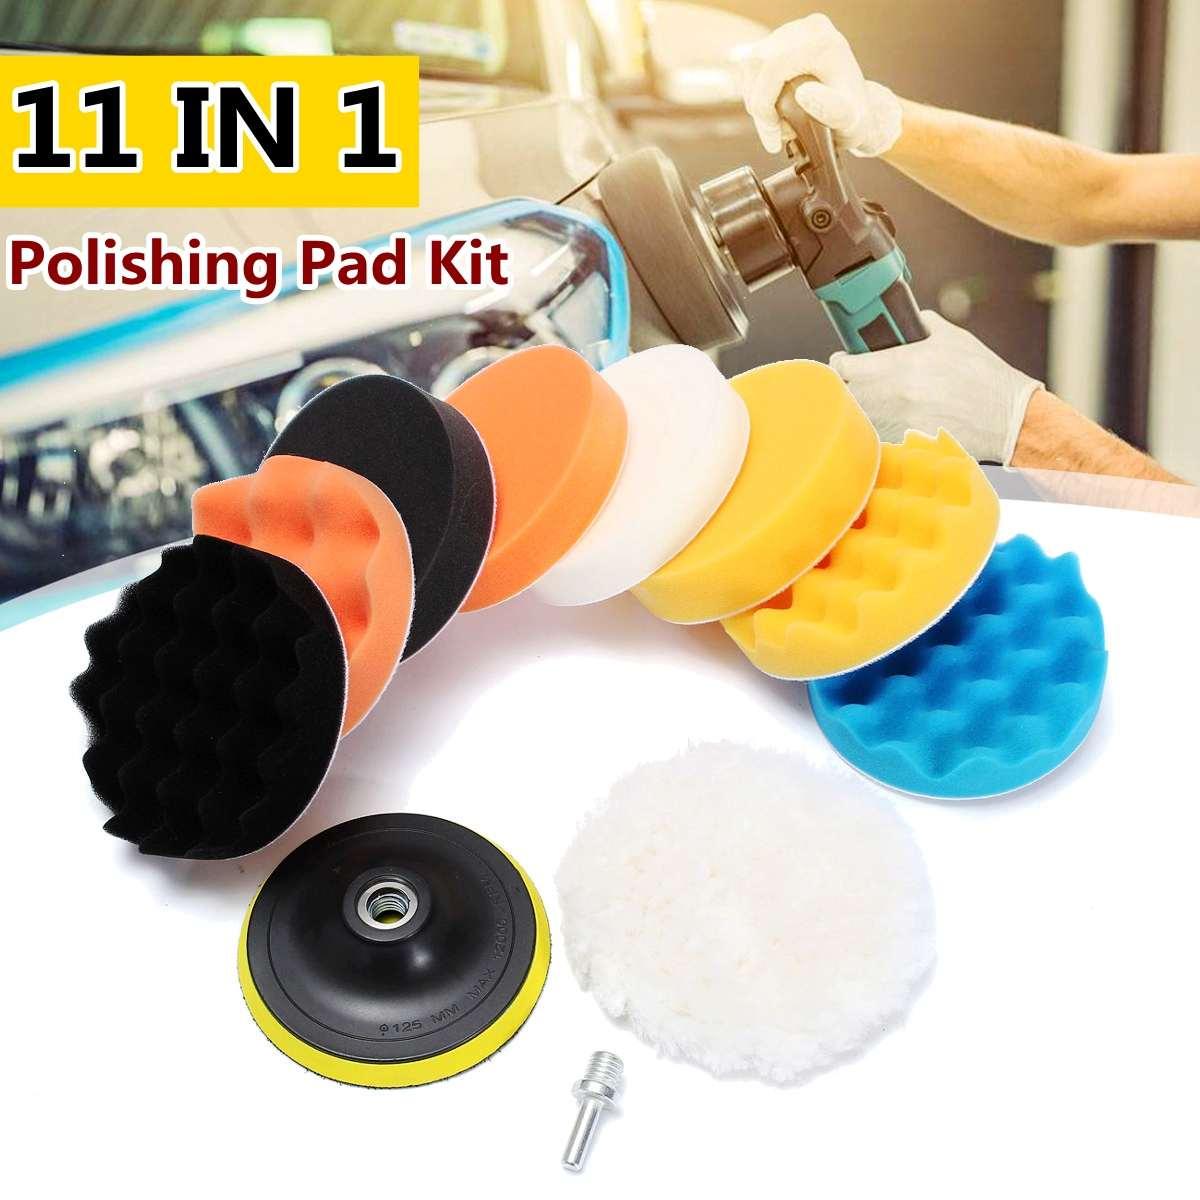 11pcs 5inch Car Polishing Pad Set Buffing Sponge Polish Auto Sponge Waxing Pads Drill Set Kit For Car Polisher Wheel Wax